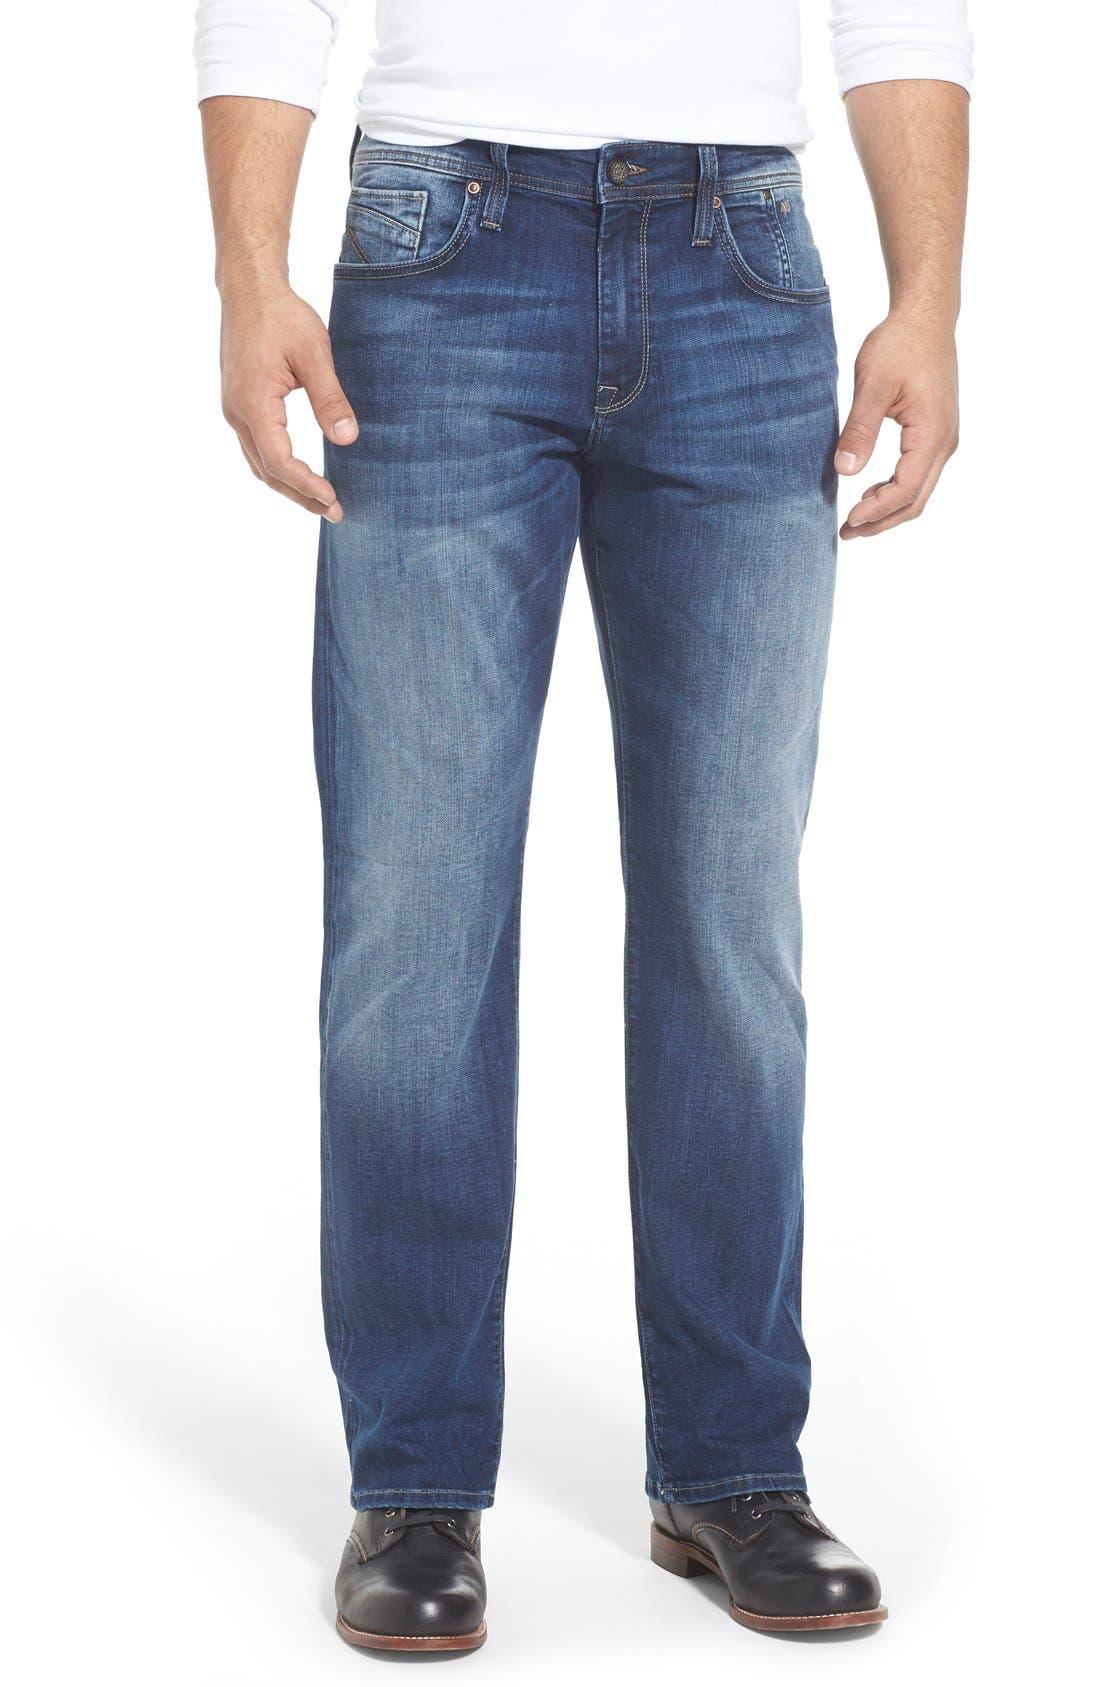 Main Image - Mavi Jeans 'Matt' Relaxed Fit Jeans (Mid Indigo Cooper)